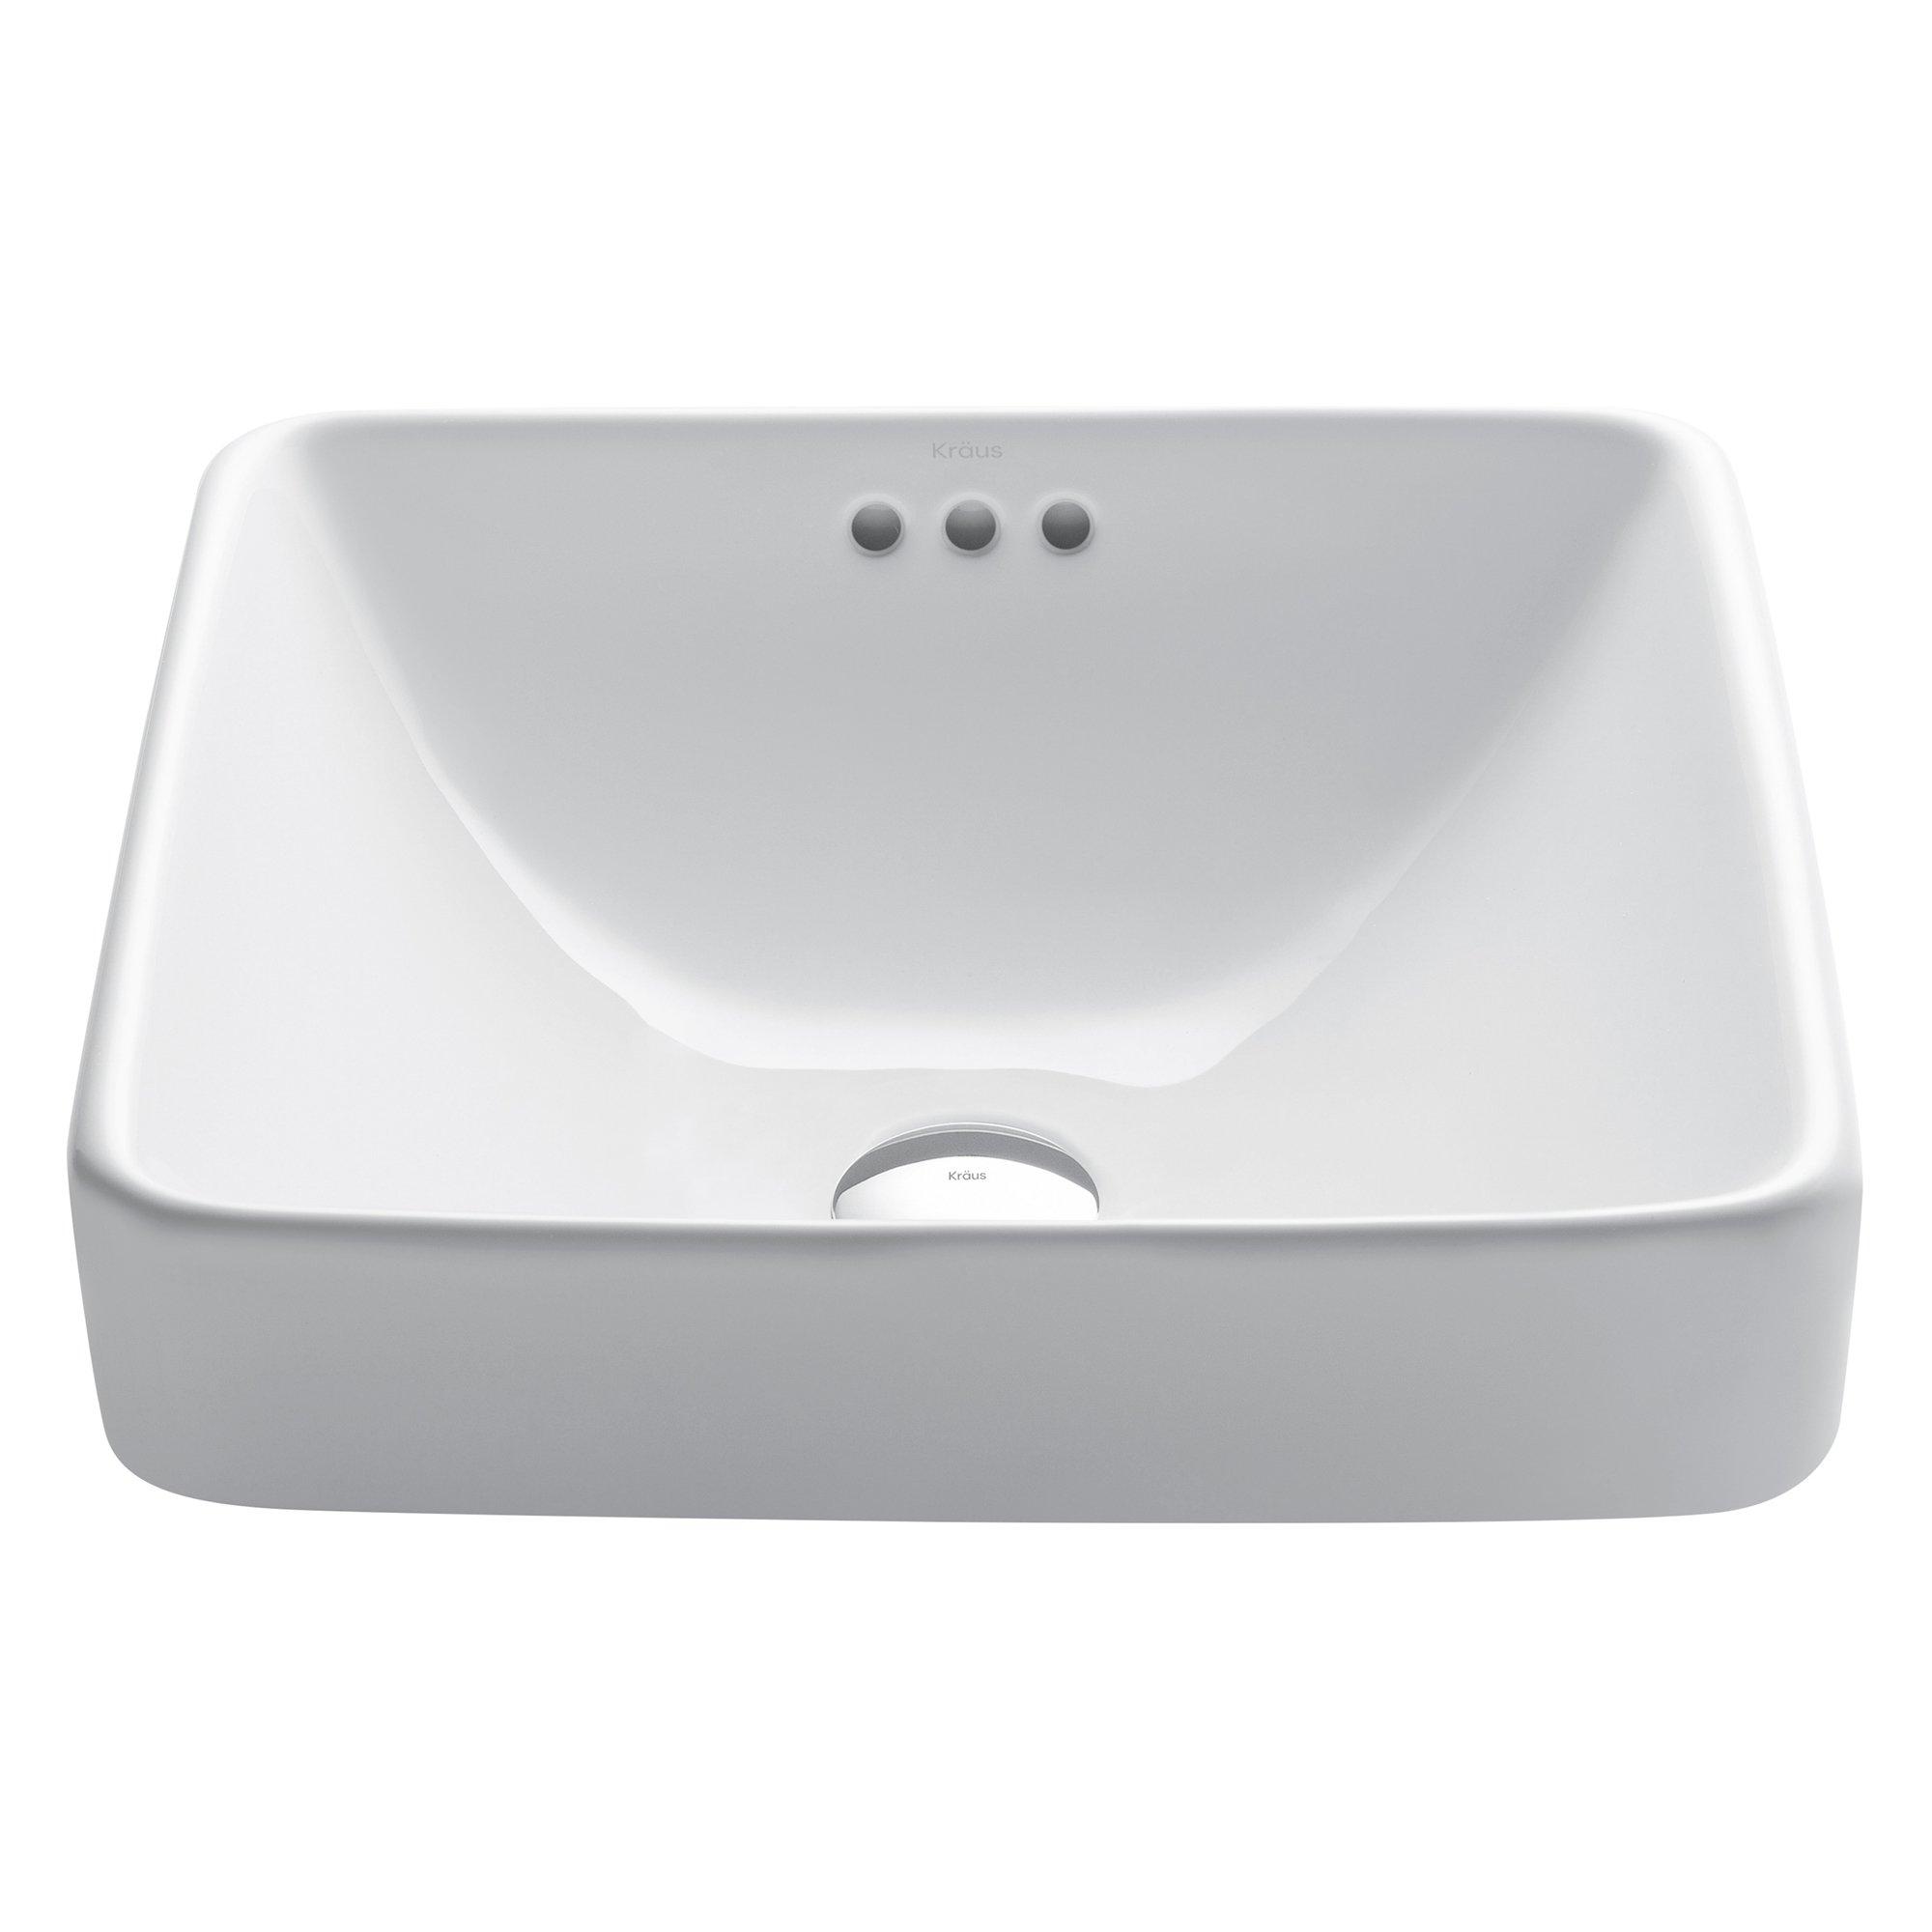 Kraus KCR-281 Modern Elavo Ceramic Square Semi-Recessed Bathroom Sink with Overflow, White